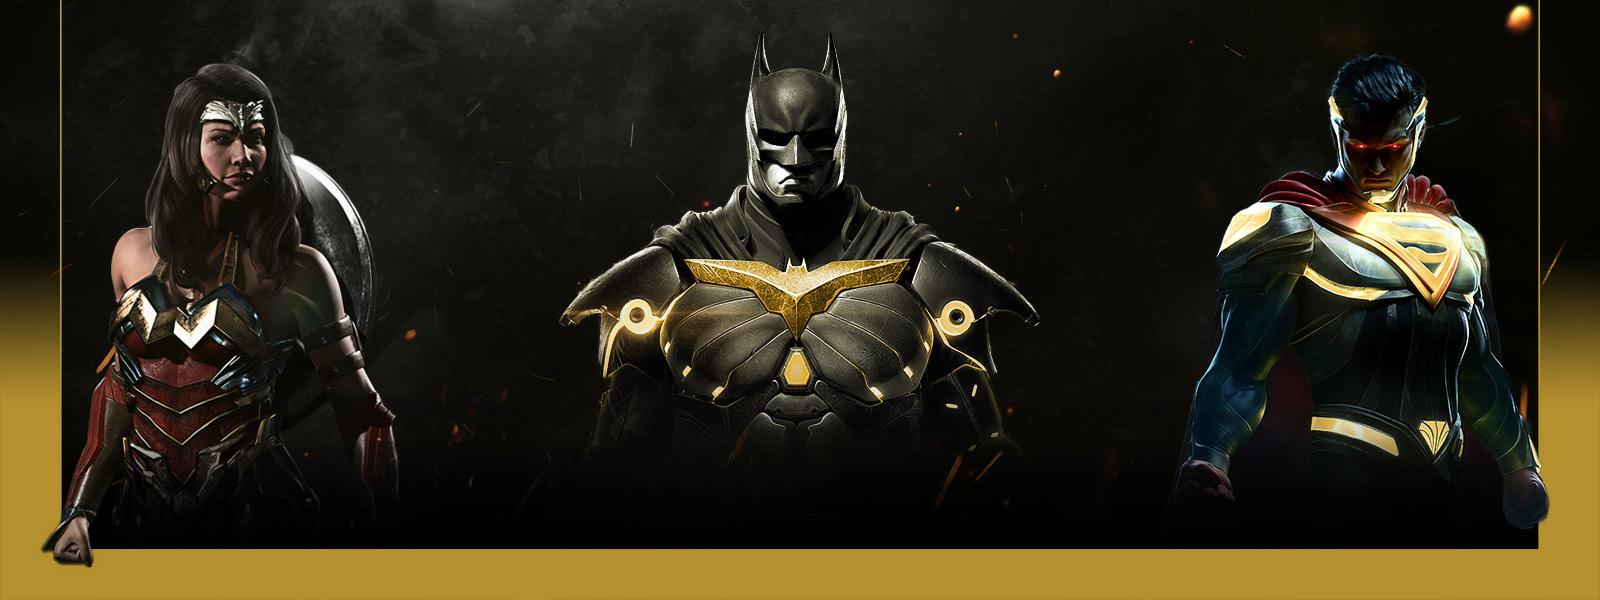 Future Superwomen Batman and Superman in Injustice 2